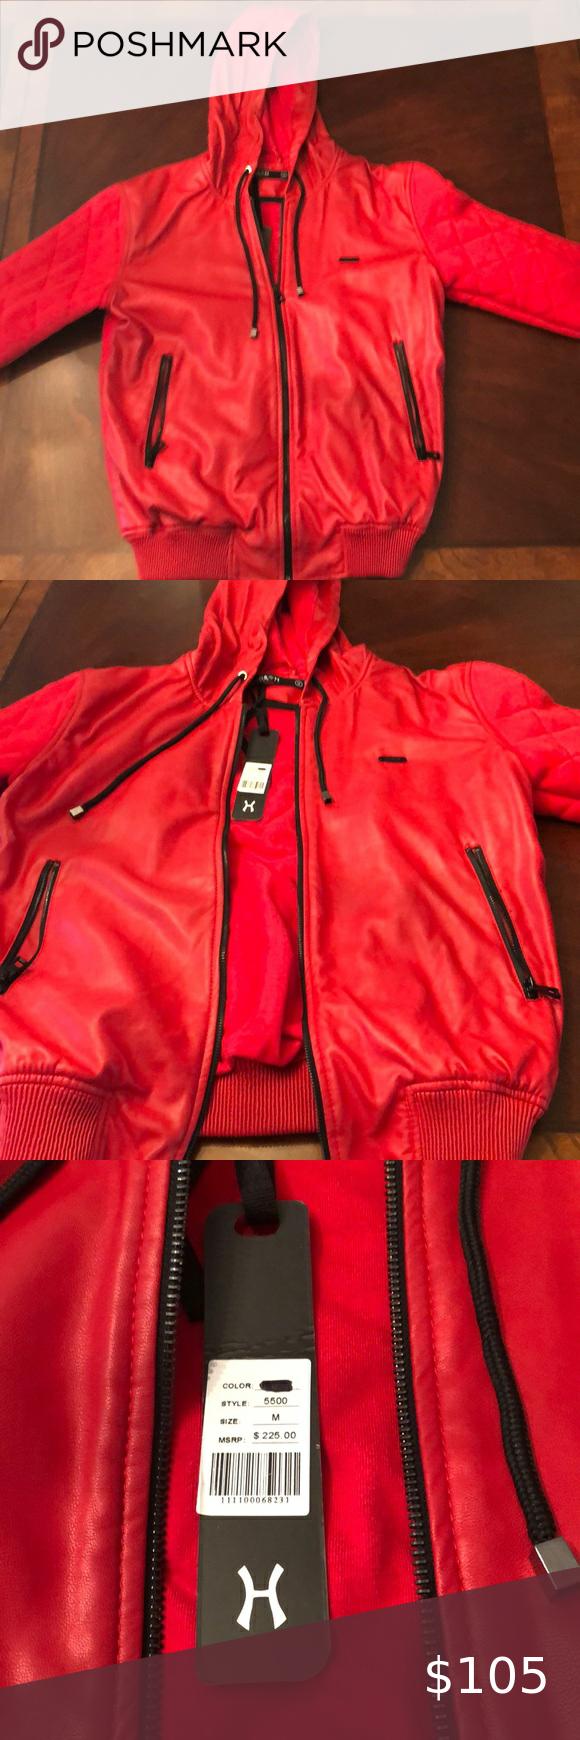 Hudson Outerwear Red Cotton Polyurethane Jacket Jackets Outerwear Outerwear Jackets [ 1740 x 580 Pixel ]